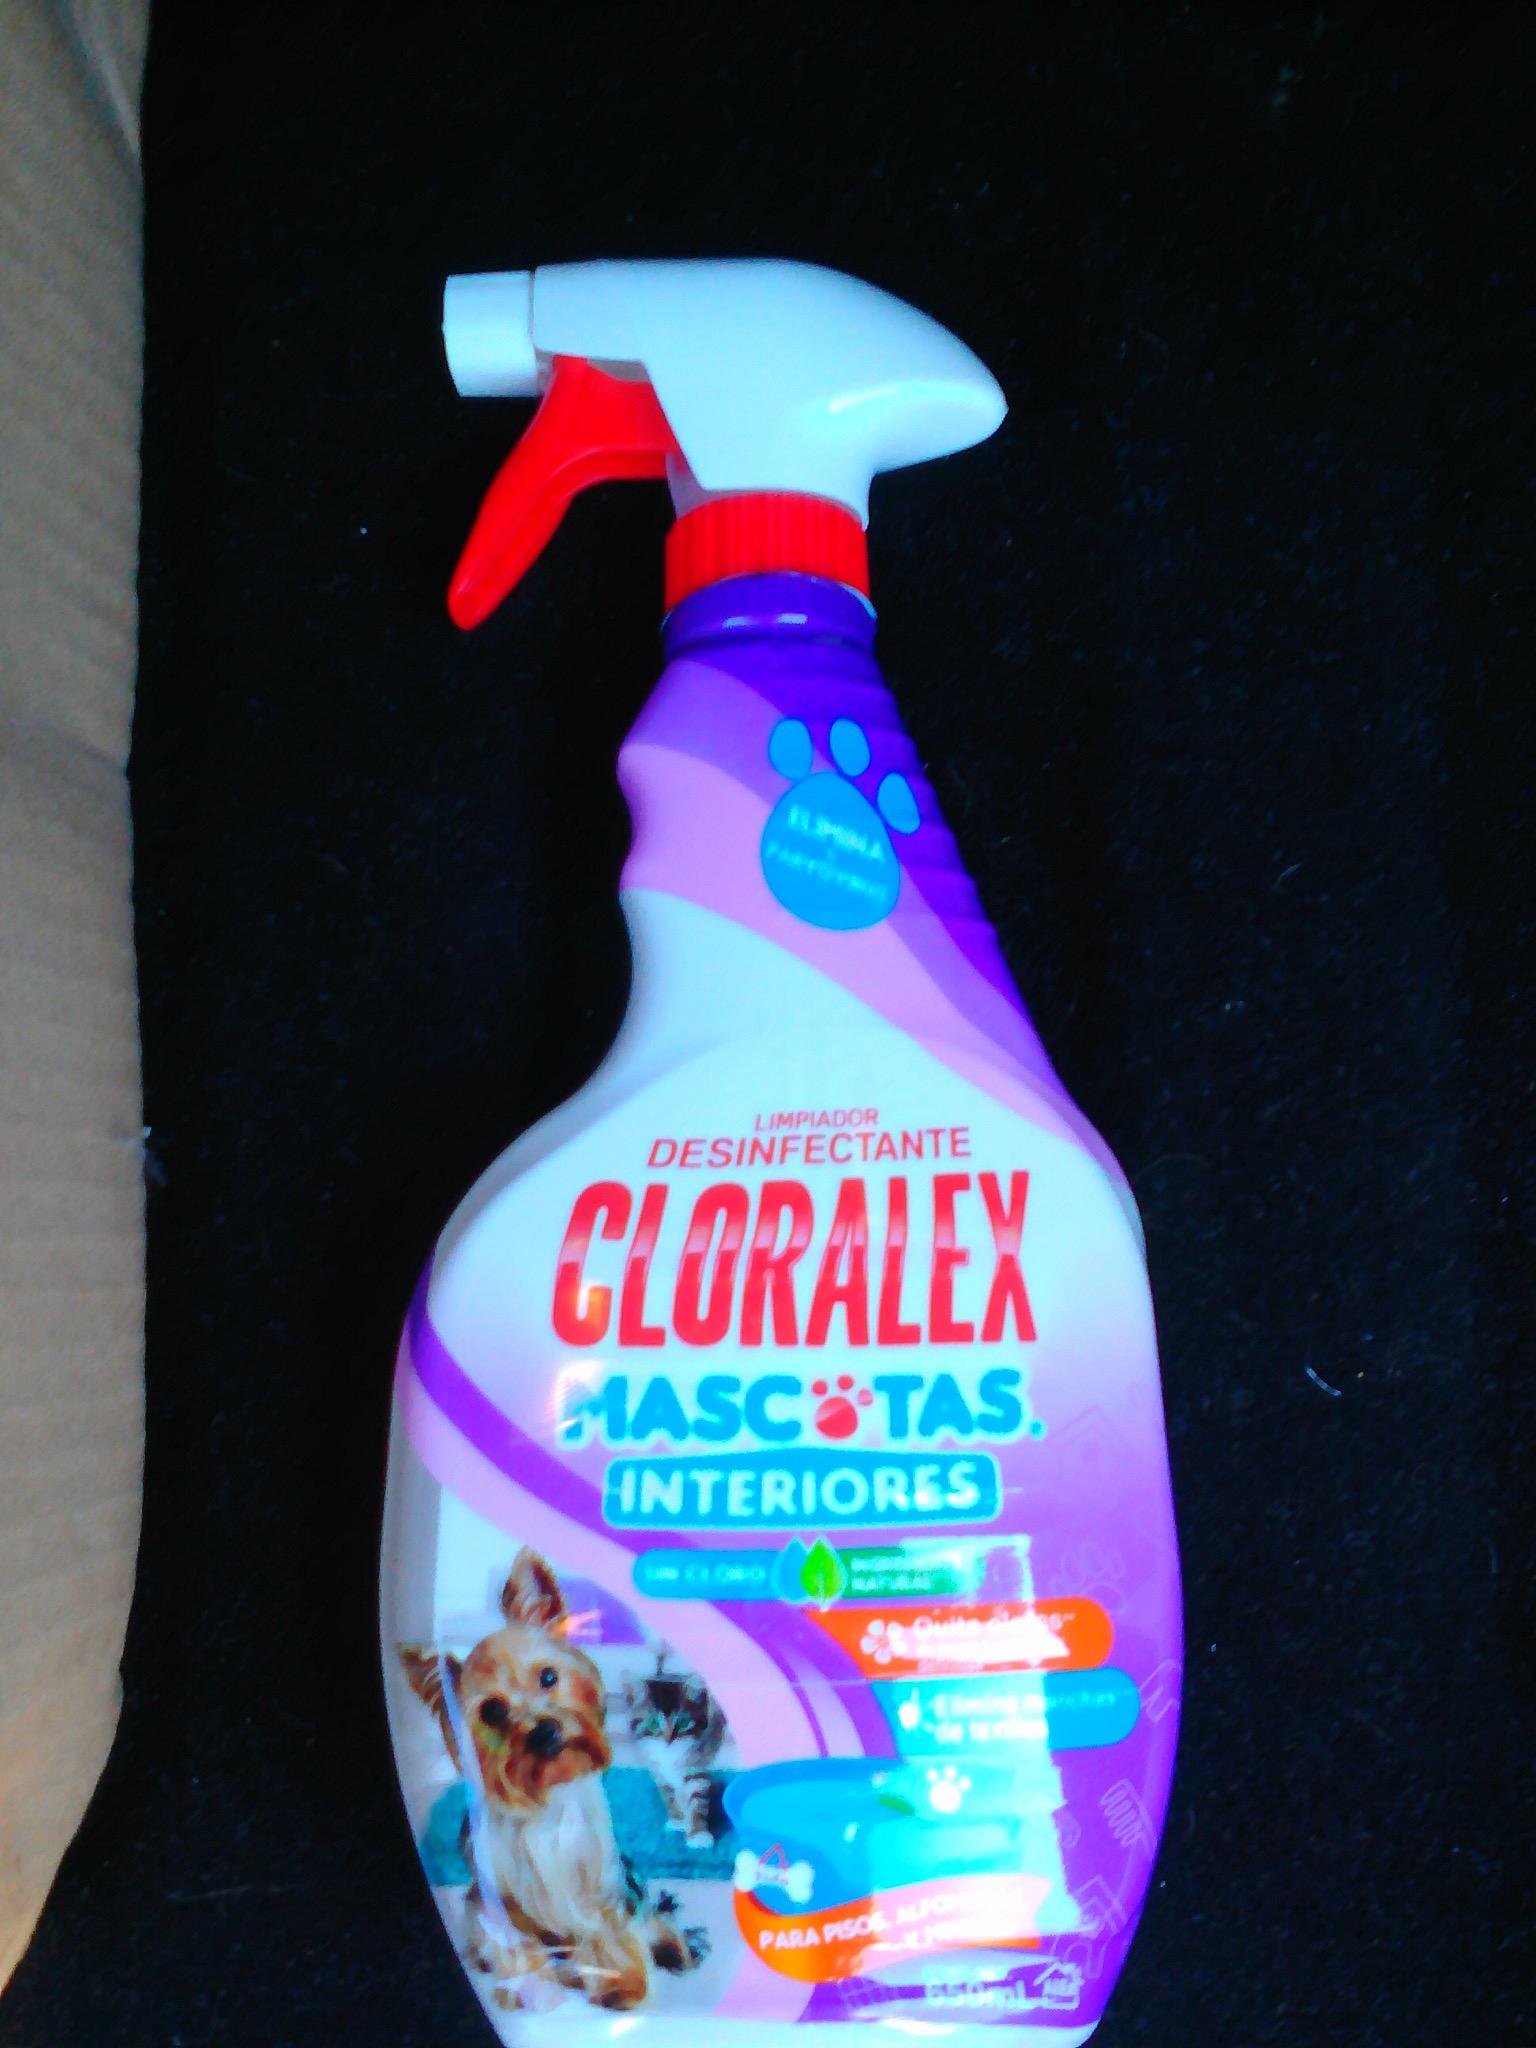 HEB Saltillo La Nogalera - Cloralex Mascotas Atomizador Interiores